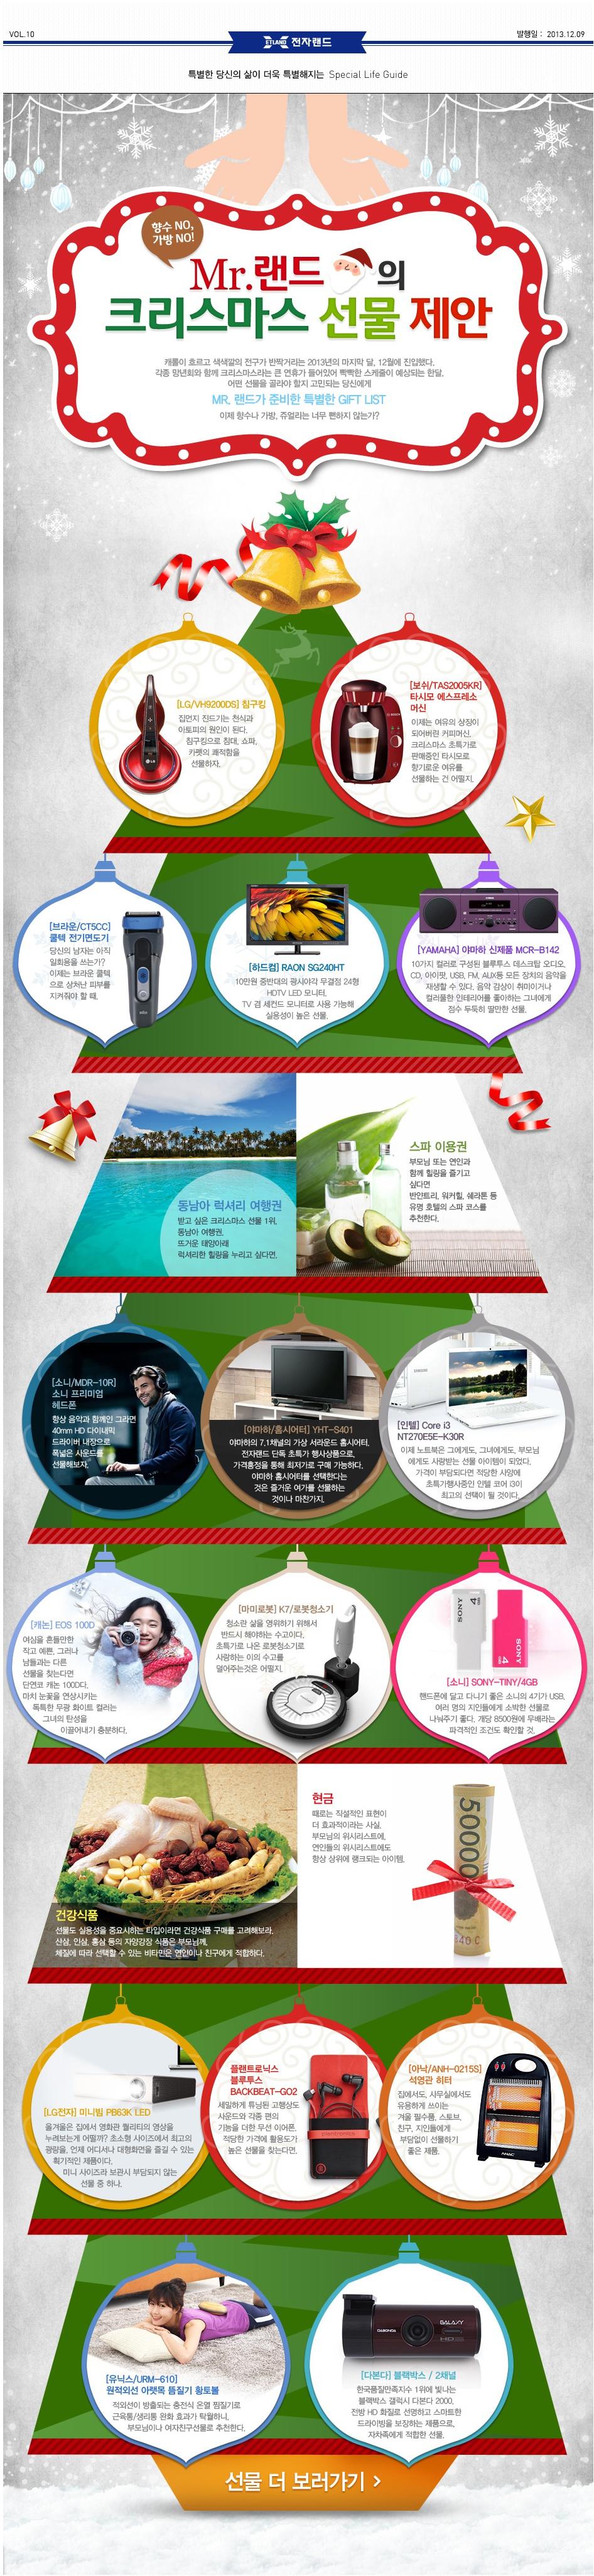 NO. 10  Mr.랜드의 크리스마스 선물 제안 http://www.etland.co.kr/etland/mail/20131209_email.html?CHANNELCODE=PI